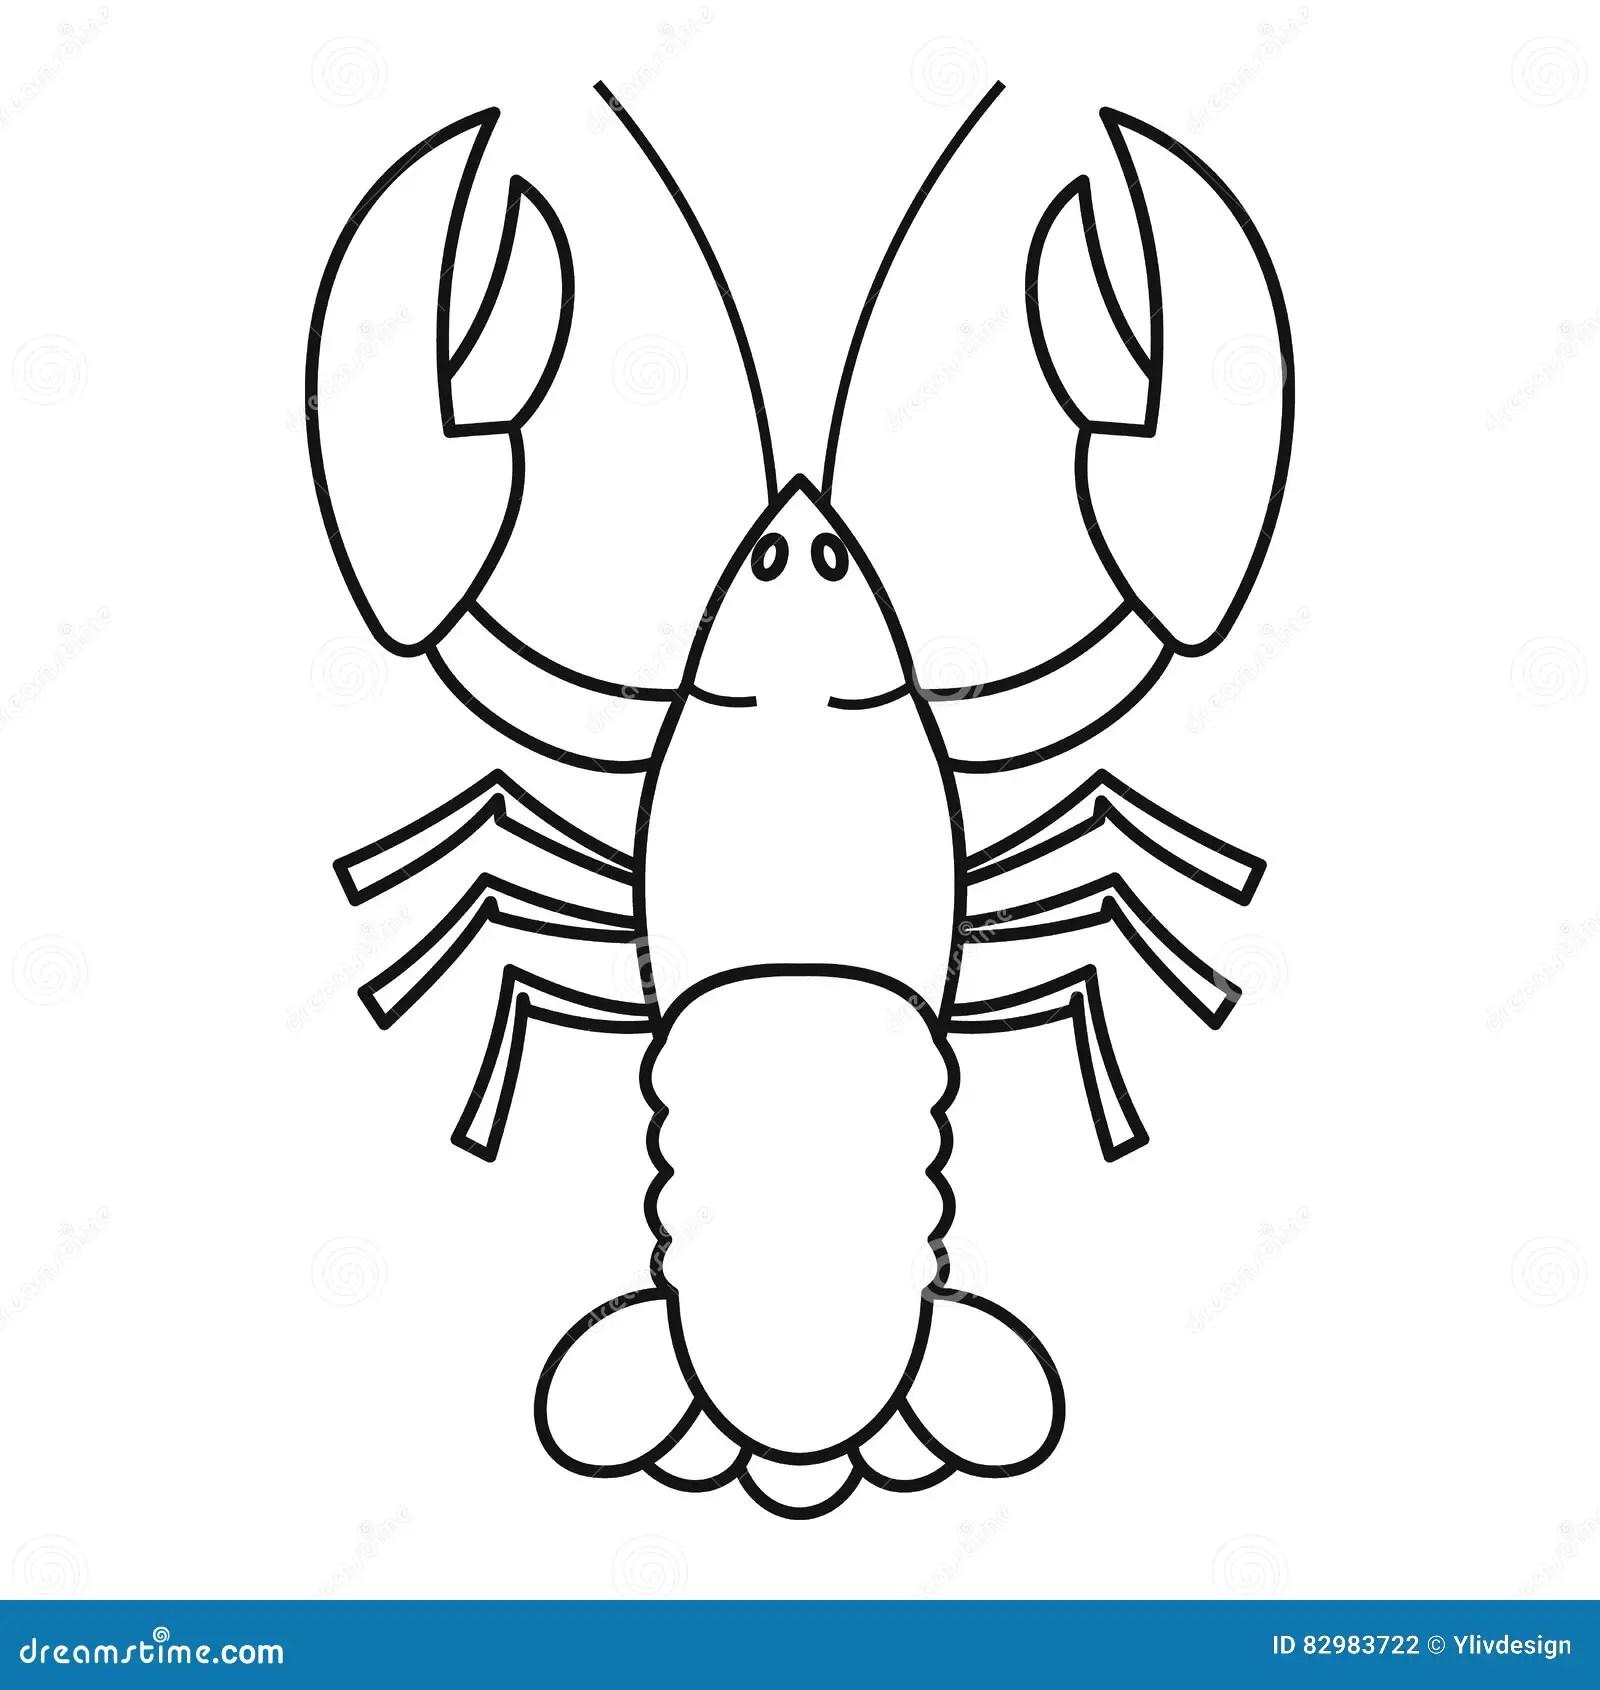 Crayfish Unlabeled Diagram Sketch Coloring Page